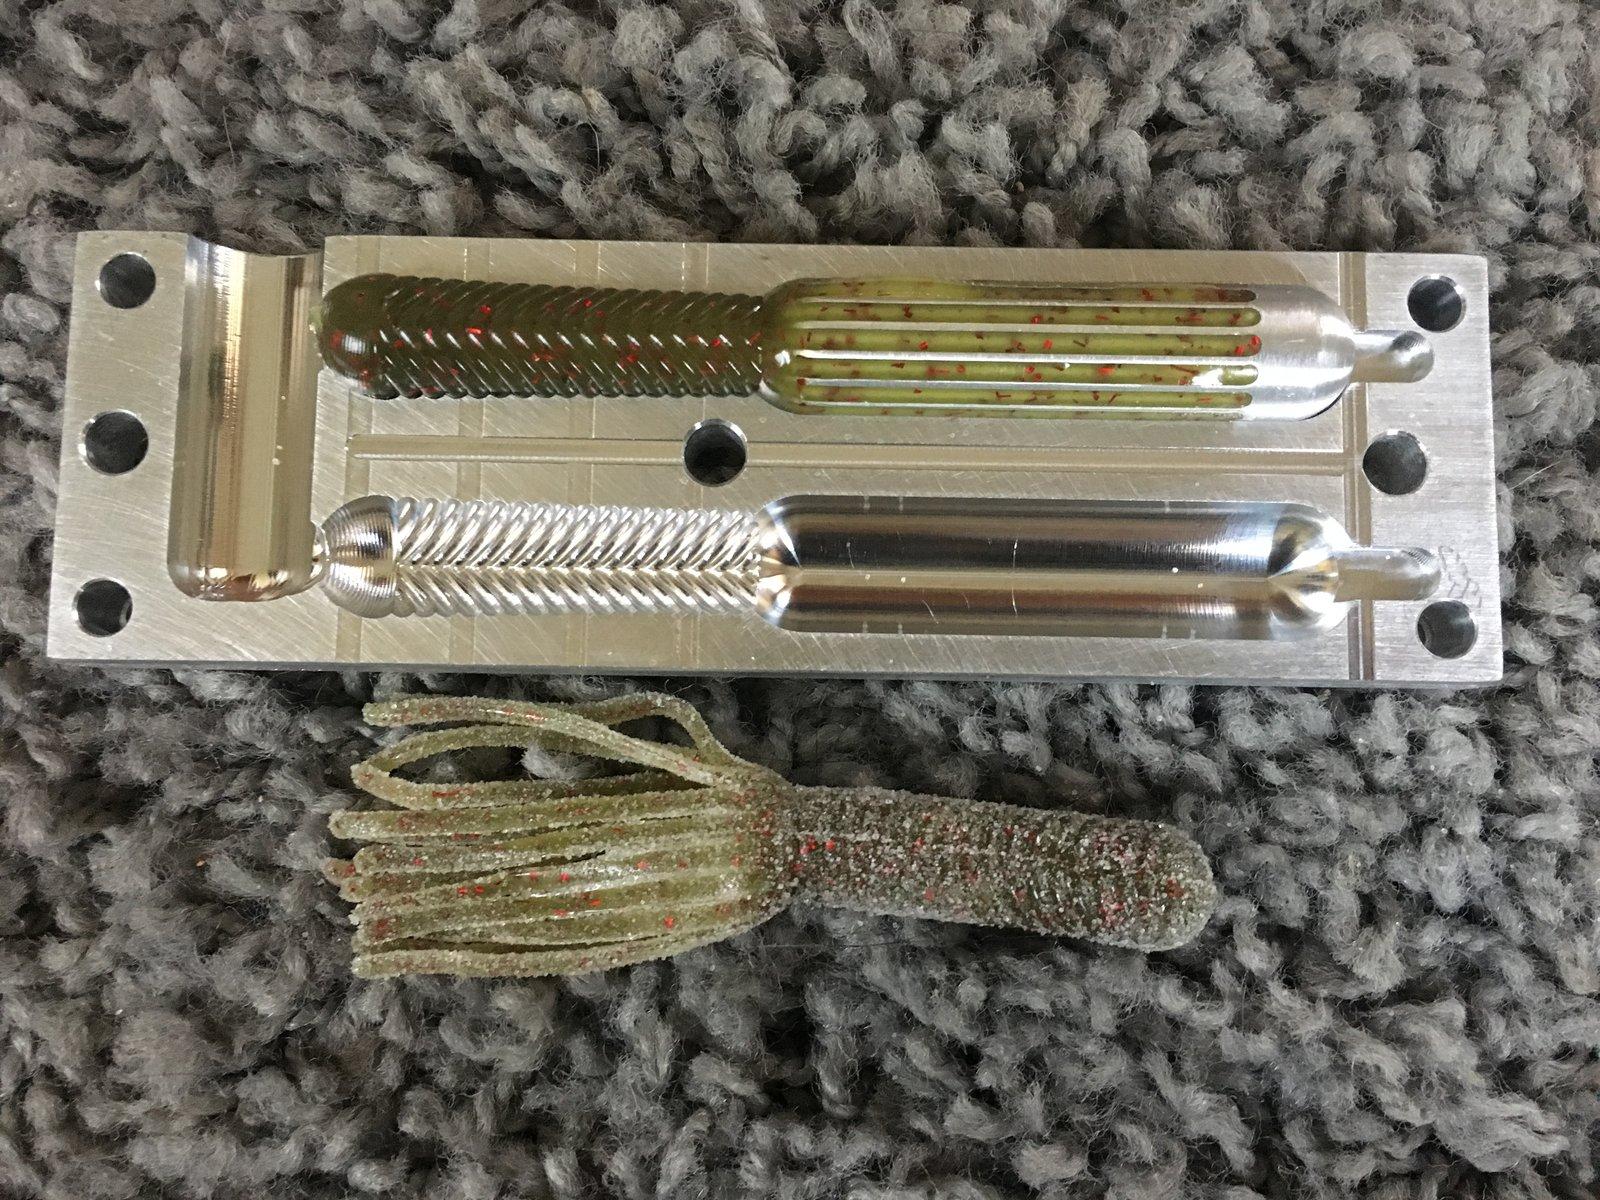 basstackle 910 tube mold